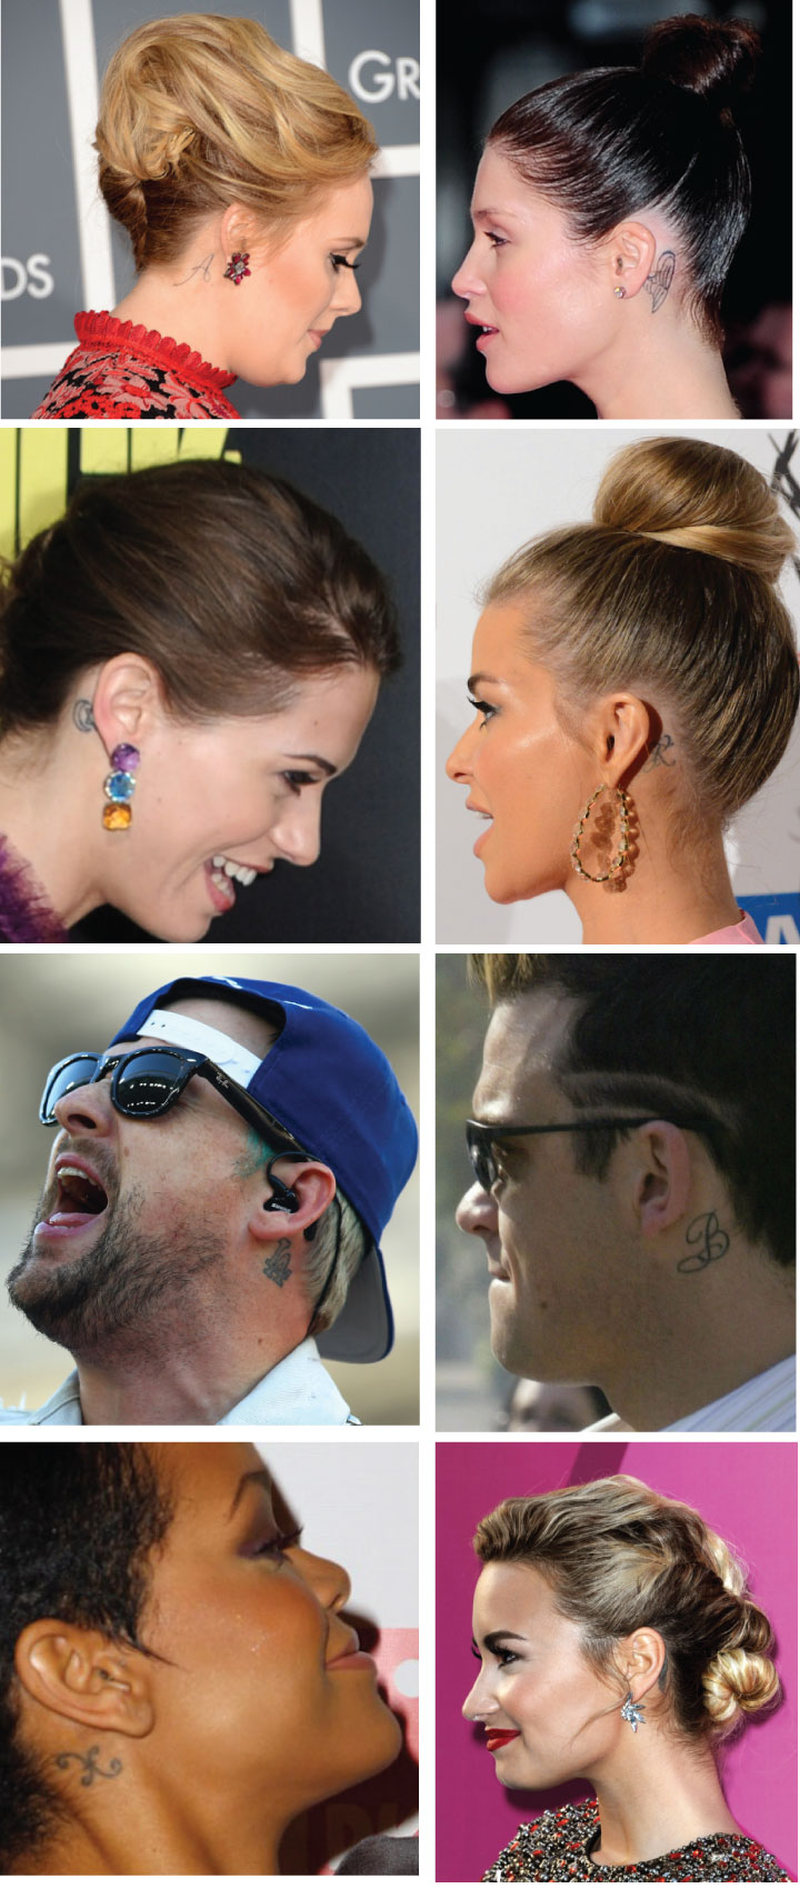 Celebrities ear tattoo designs